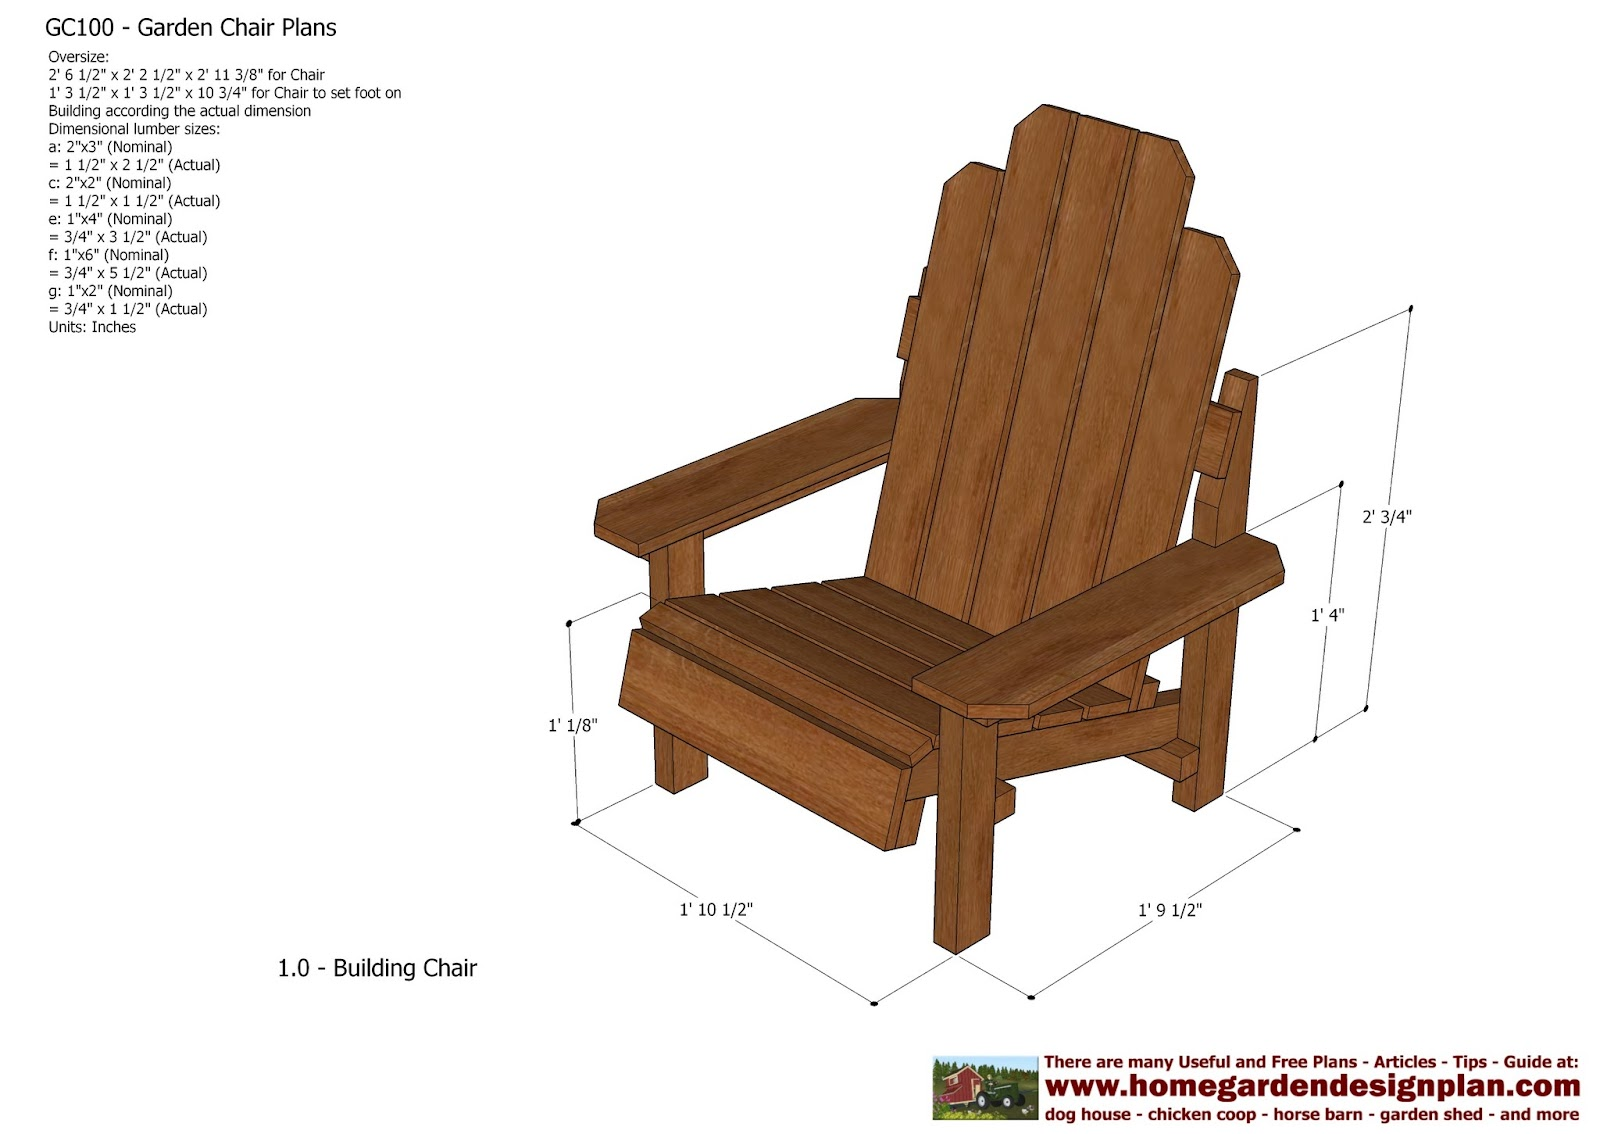 chair design garden convertible bed ikea 31 perfect woodworking egorlin